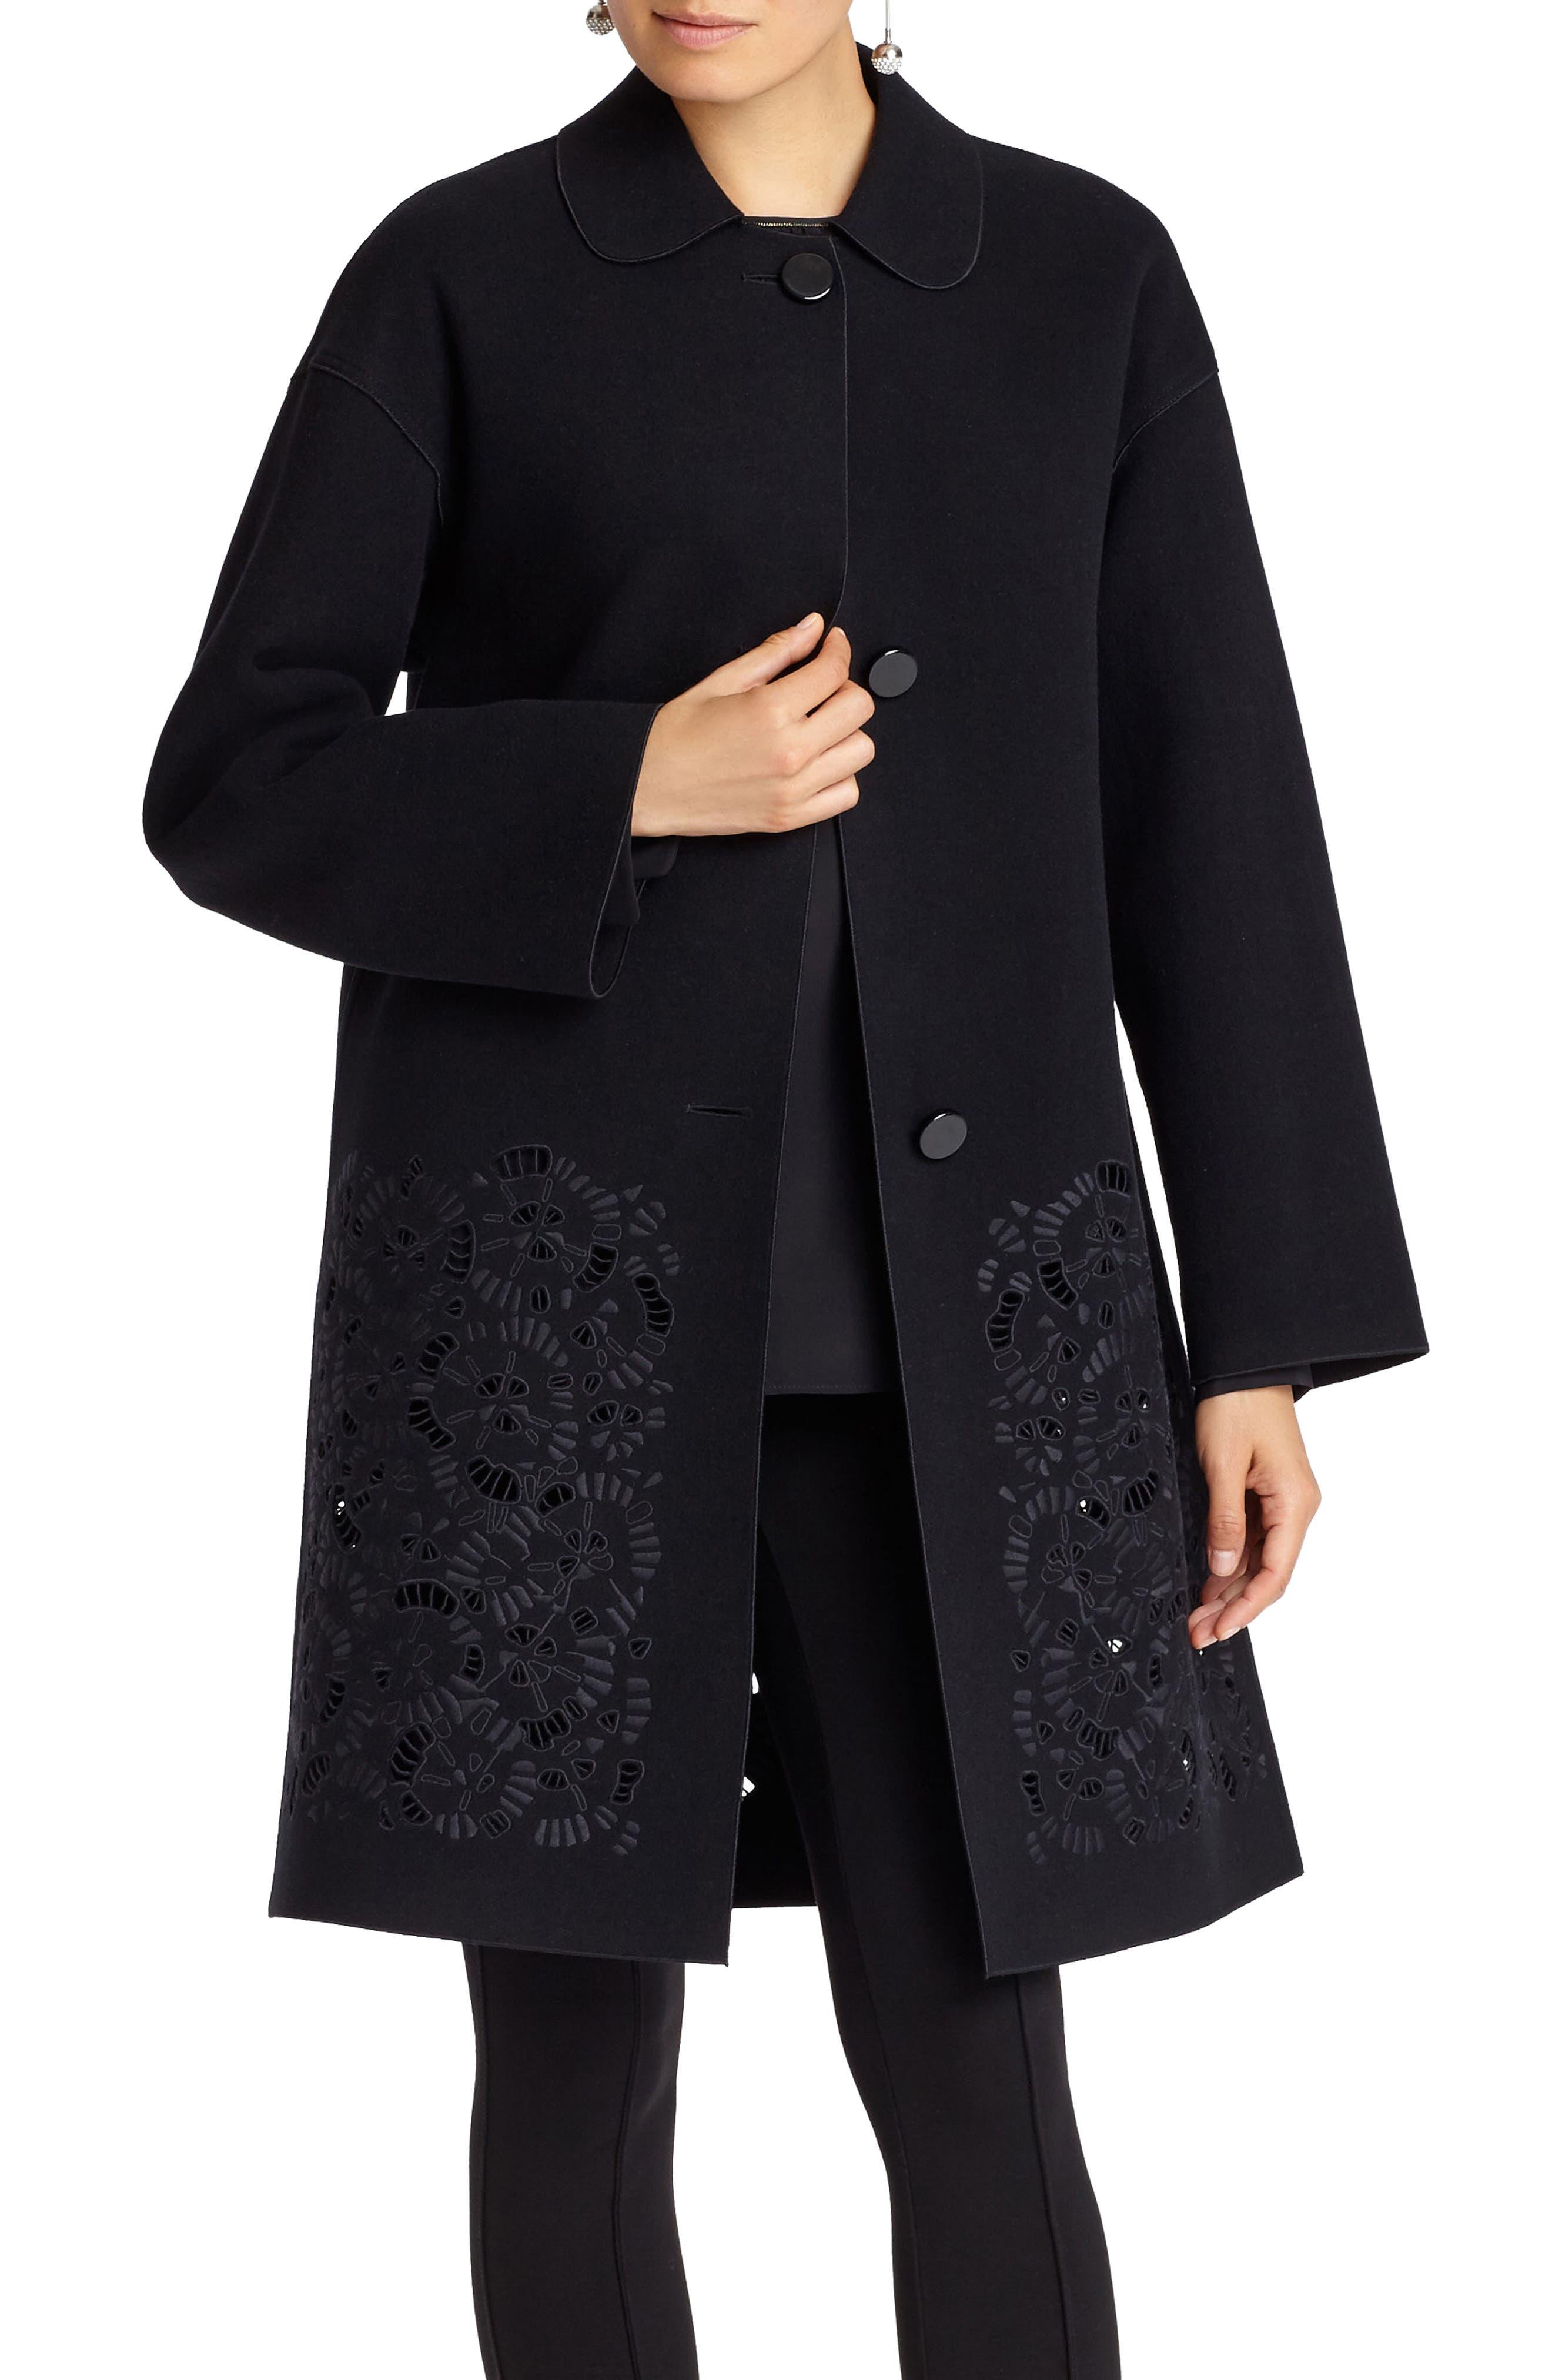 Vita Laser Cut Embroidered Coat,                         Main,                         color, 001